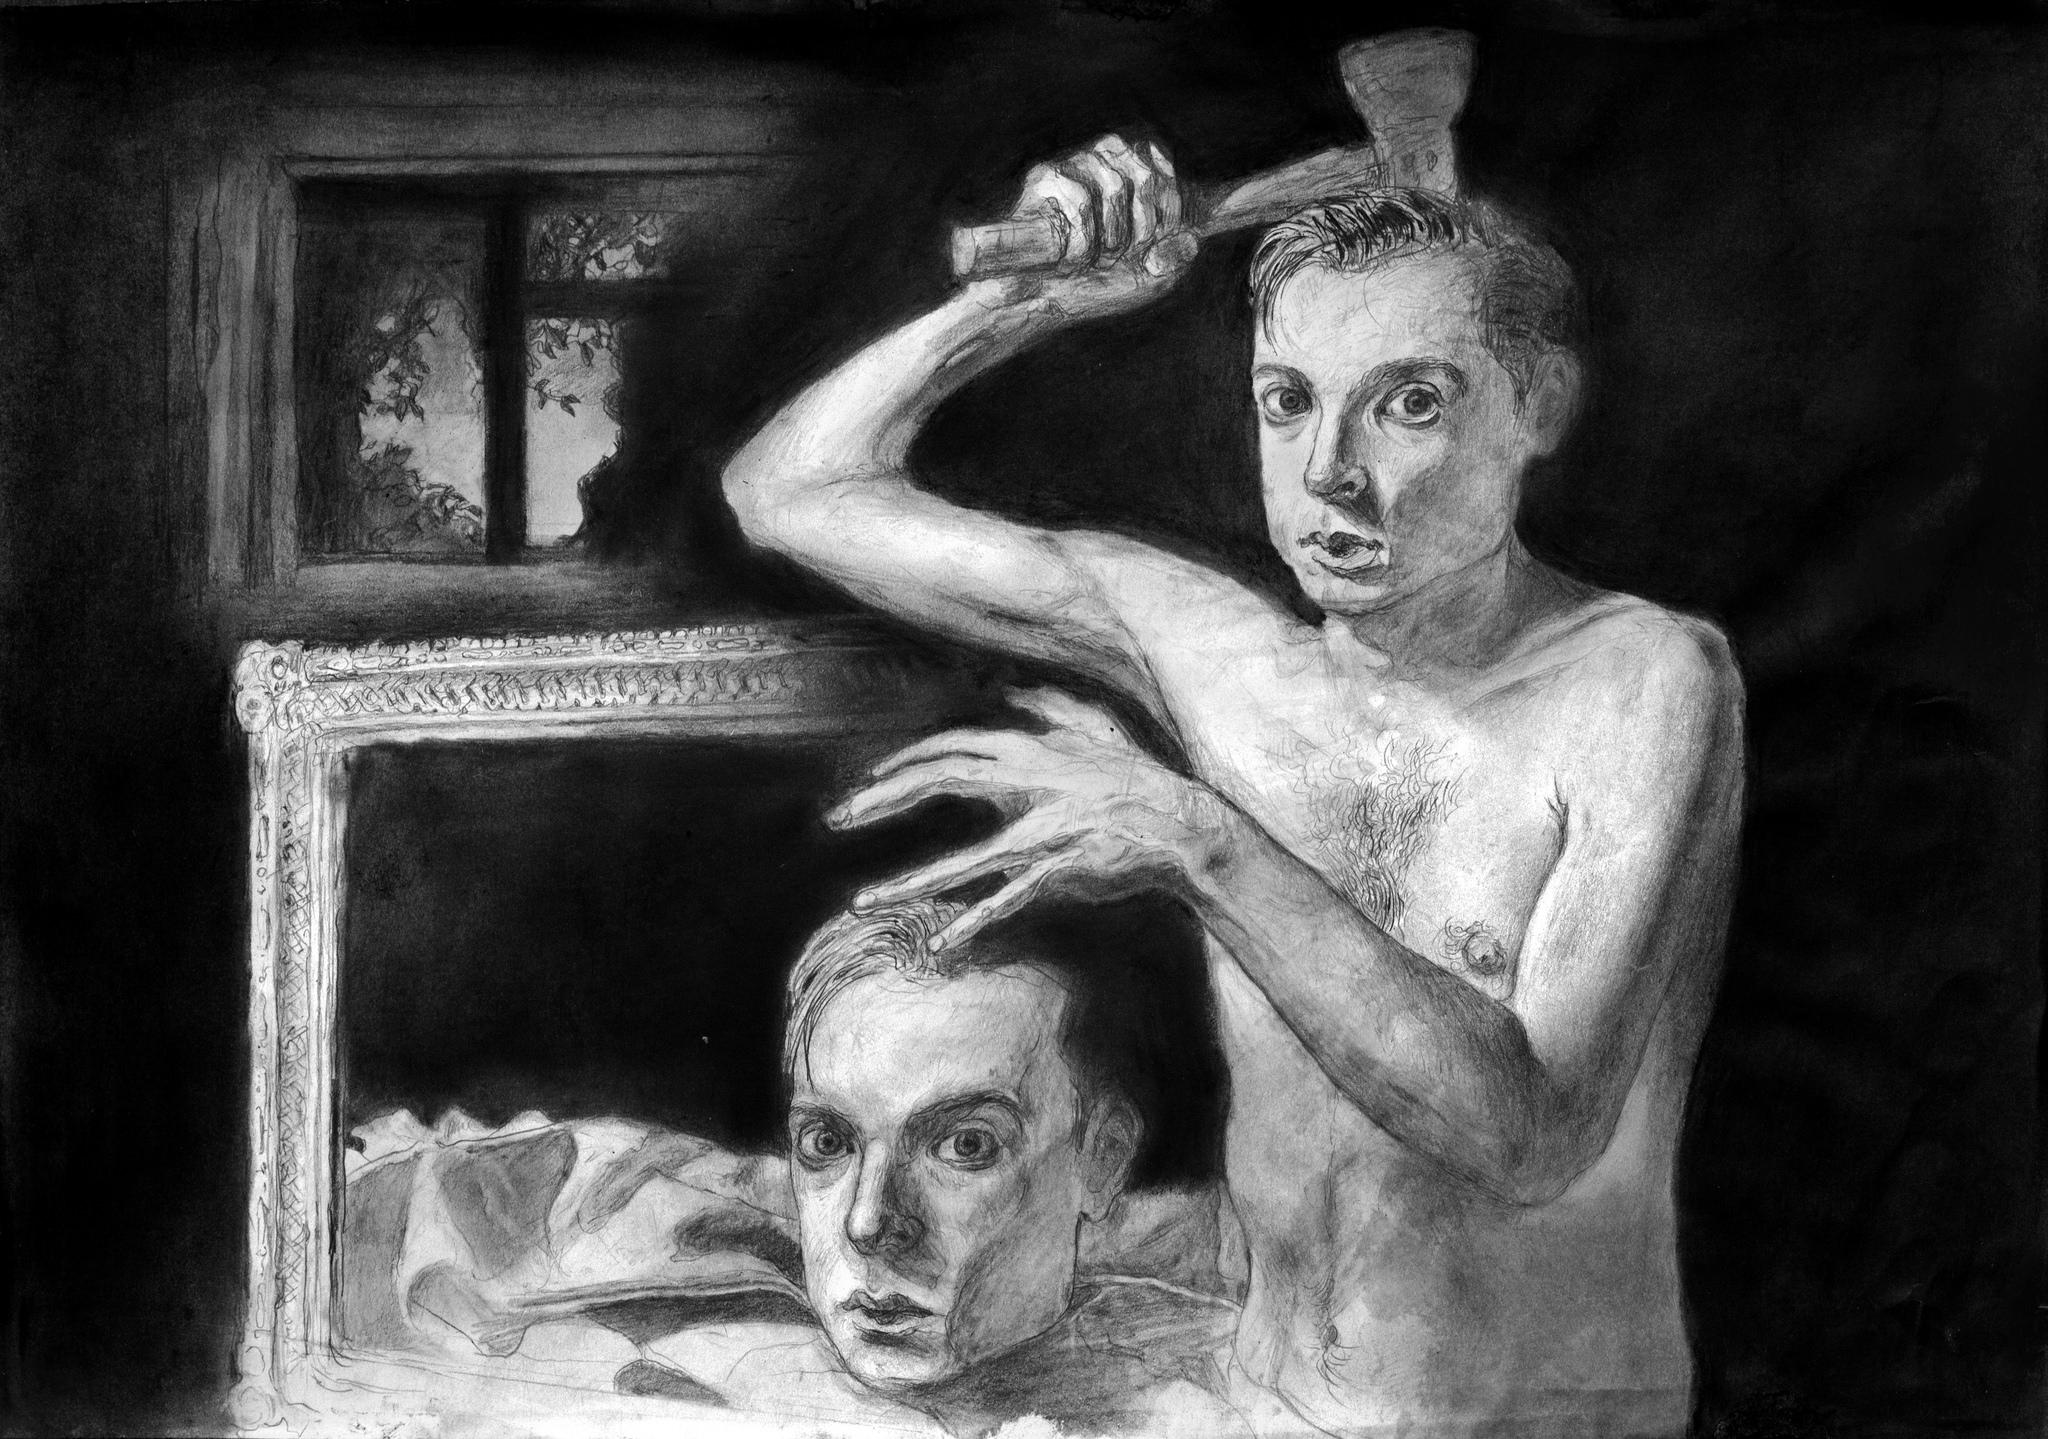 Illustration of identical twins